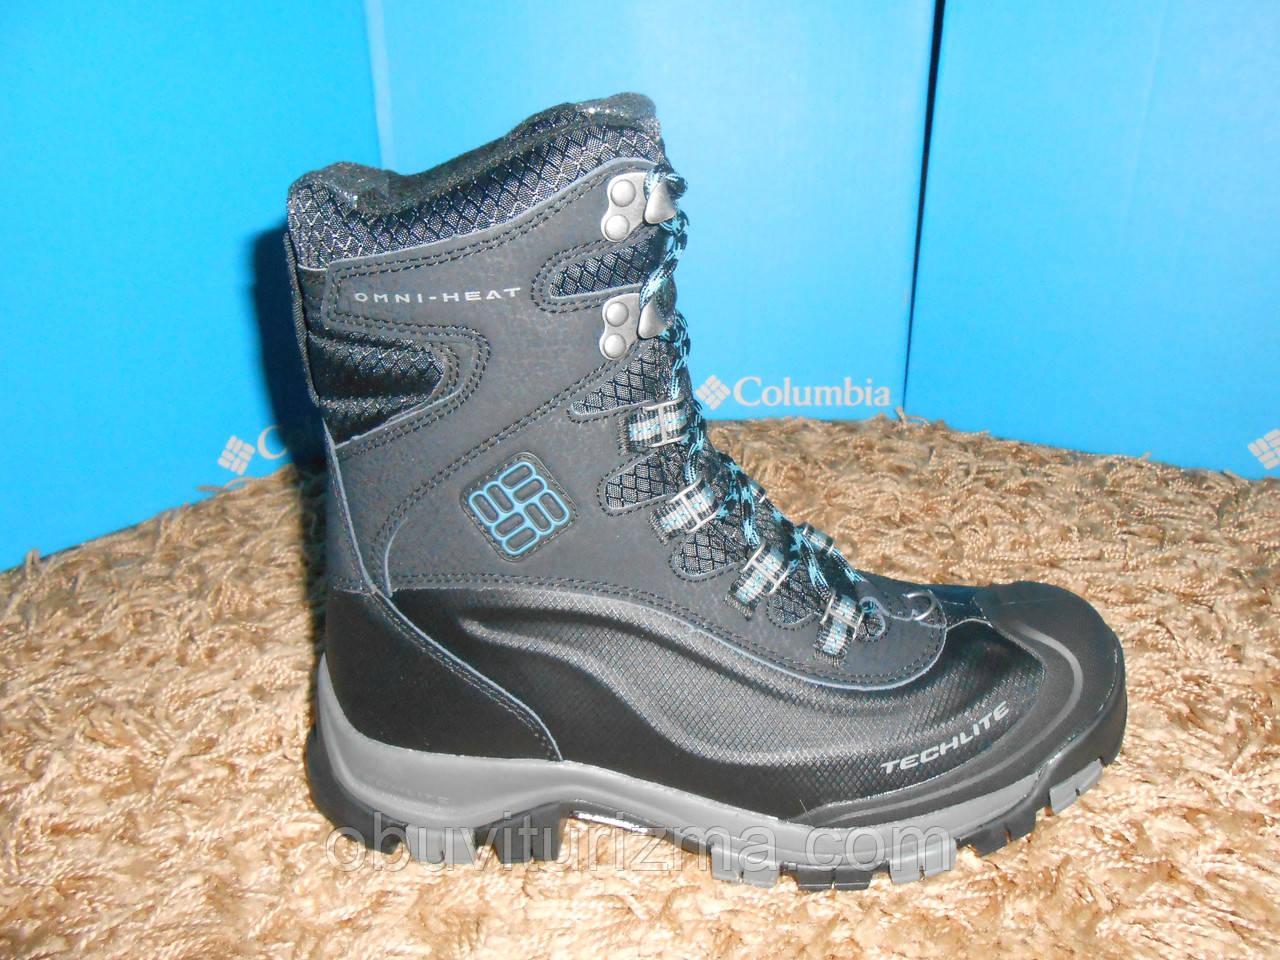 Ботинки Columbia Women s Bugaboot™ Plus Omni-Heat™ Michelin Boot ... 4cb19c1b3179e